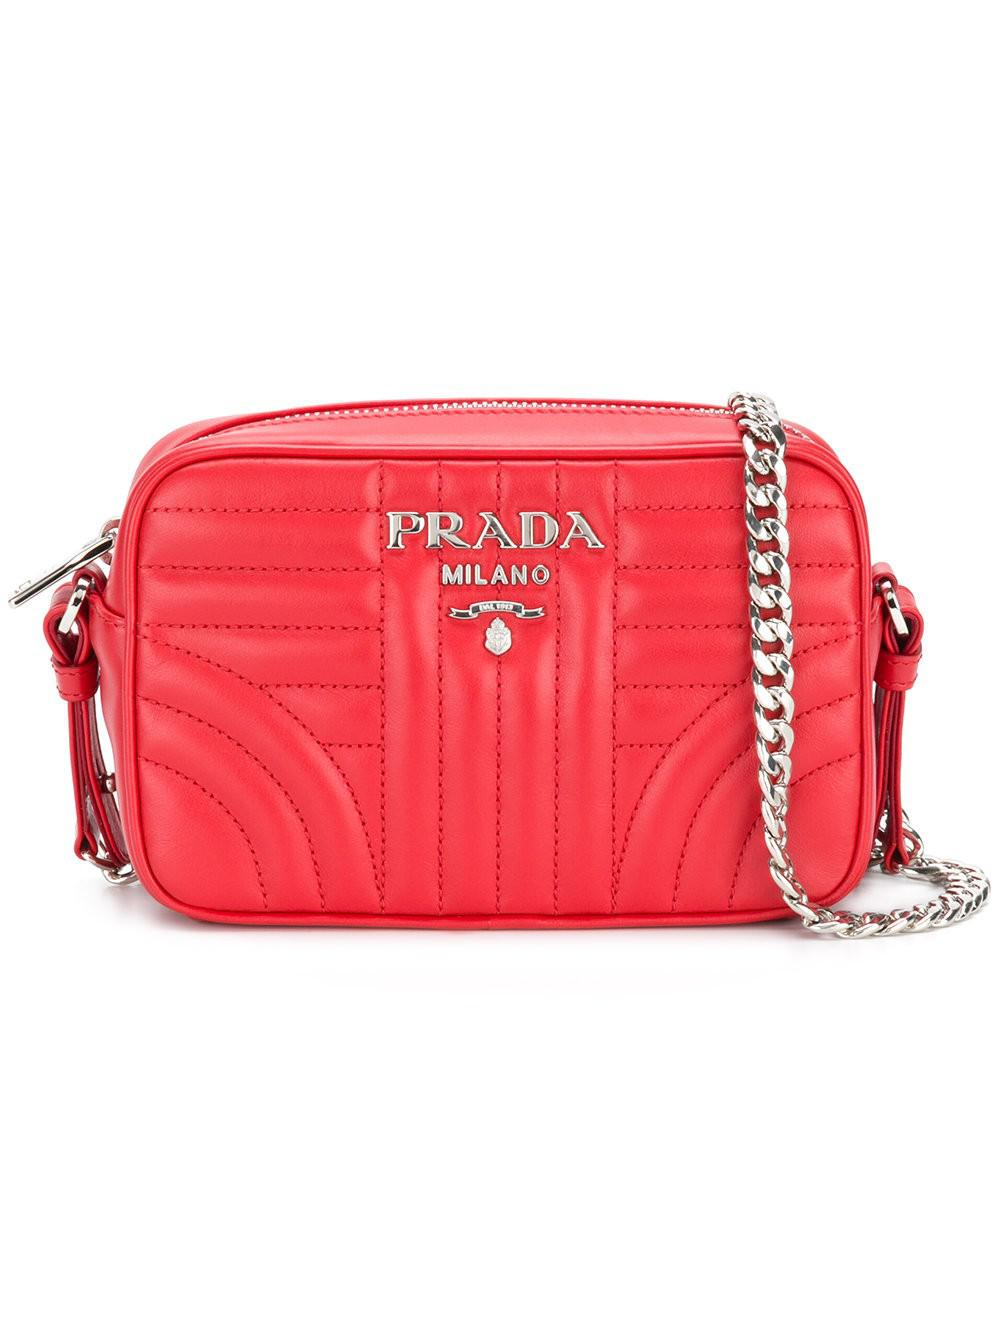 Cross Body Bags - Diagramme Crossbody Bag Leather Red - red - Cross Body Bags for ladies Prada UIXbPtxEI